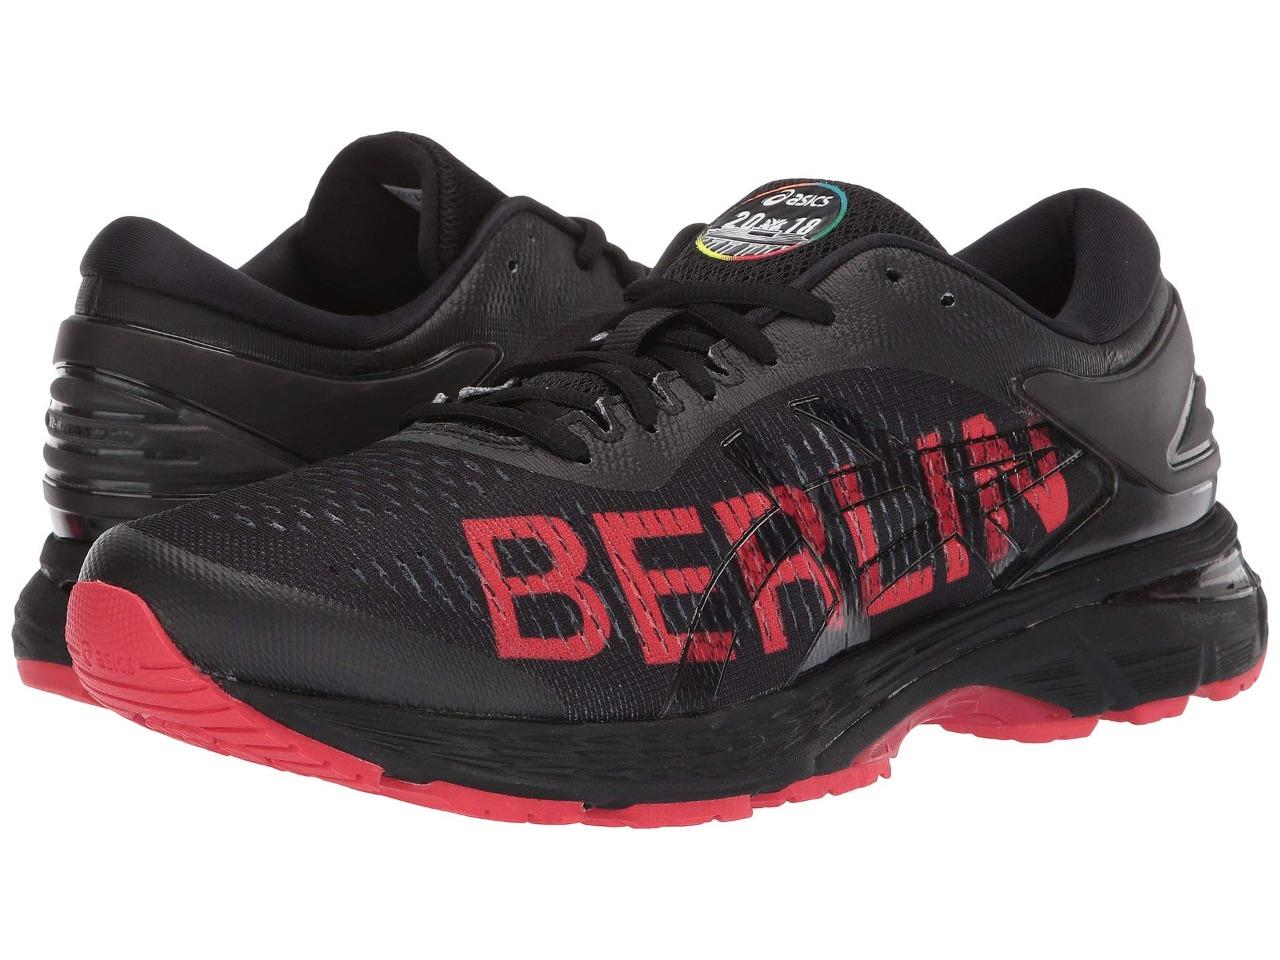 New Women's ASICS BERLIN Gel Kayano 25 Running Shoes Size 7 11 1012A119 001 | eBay